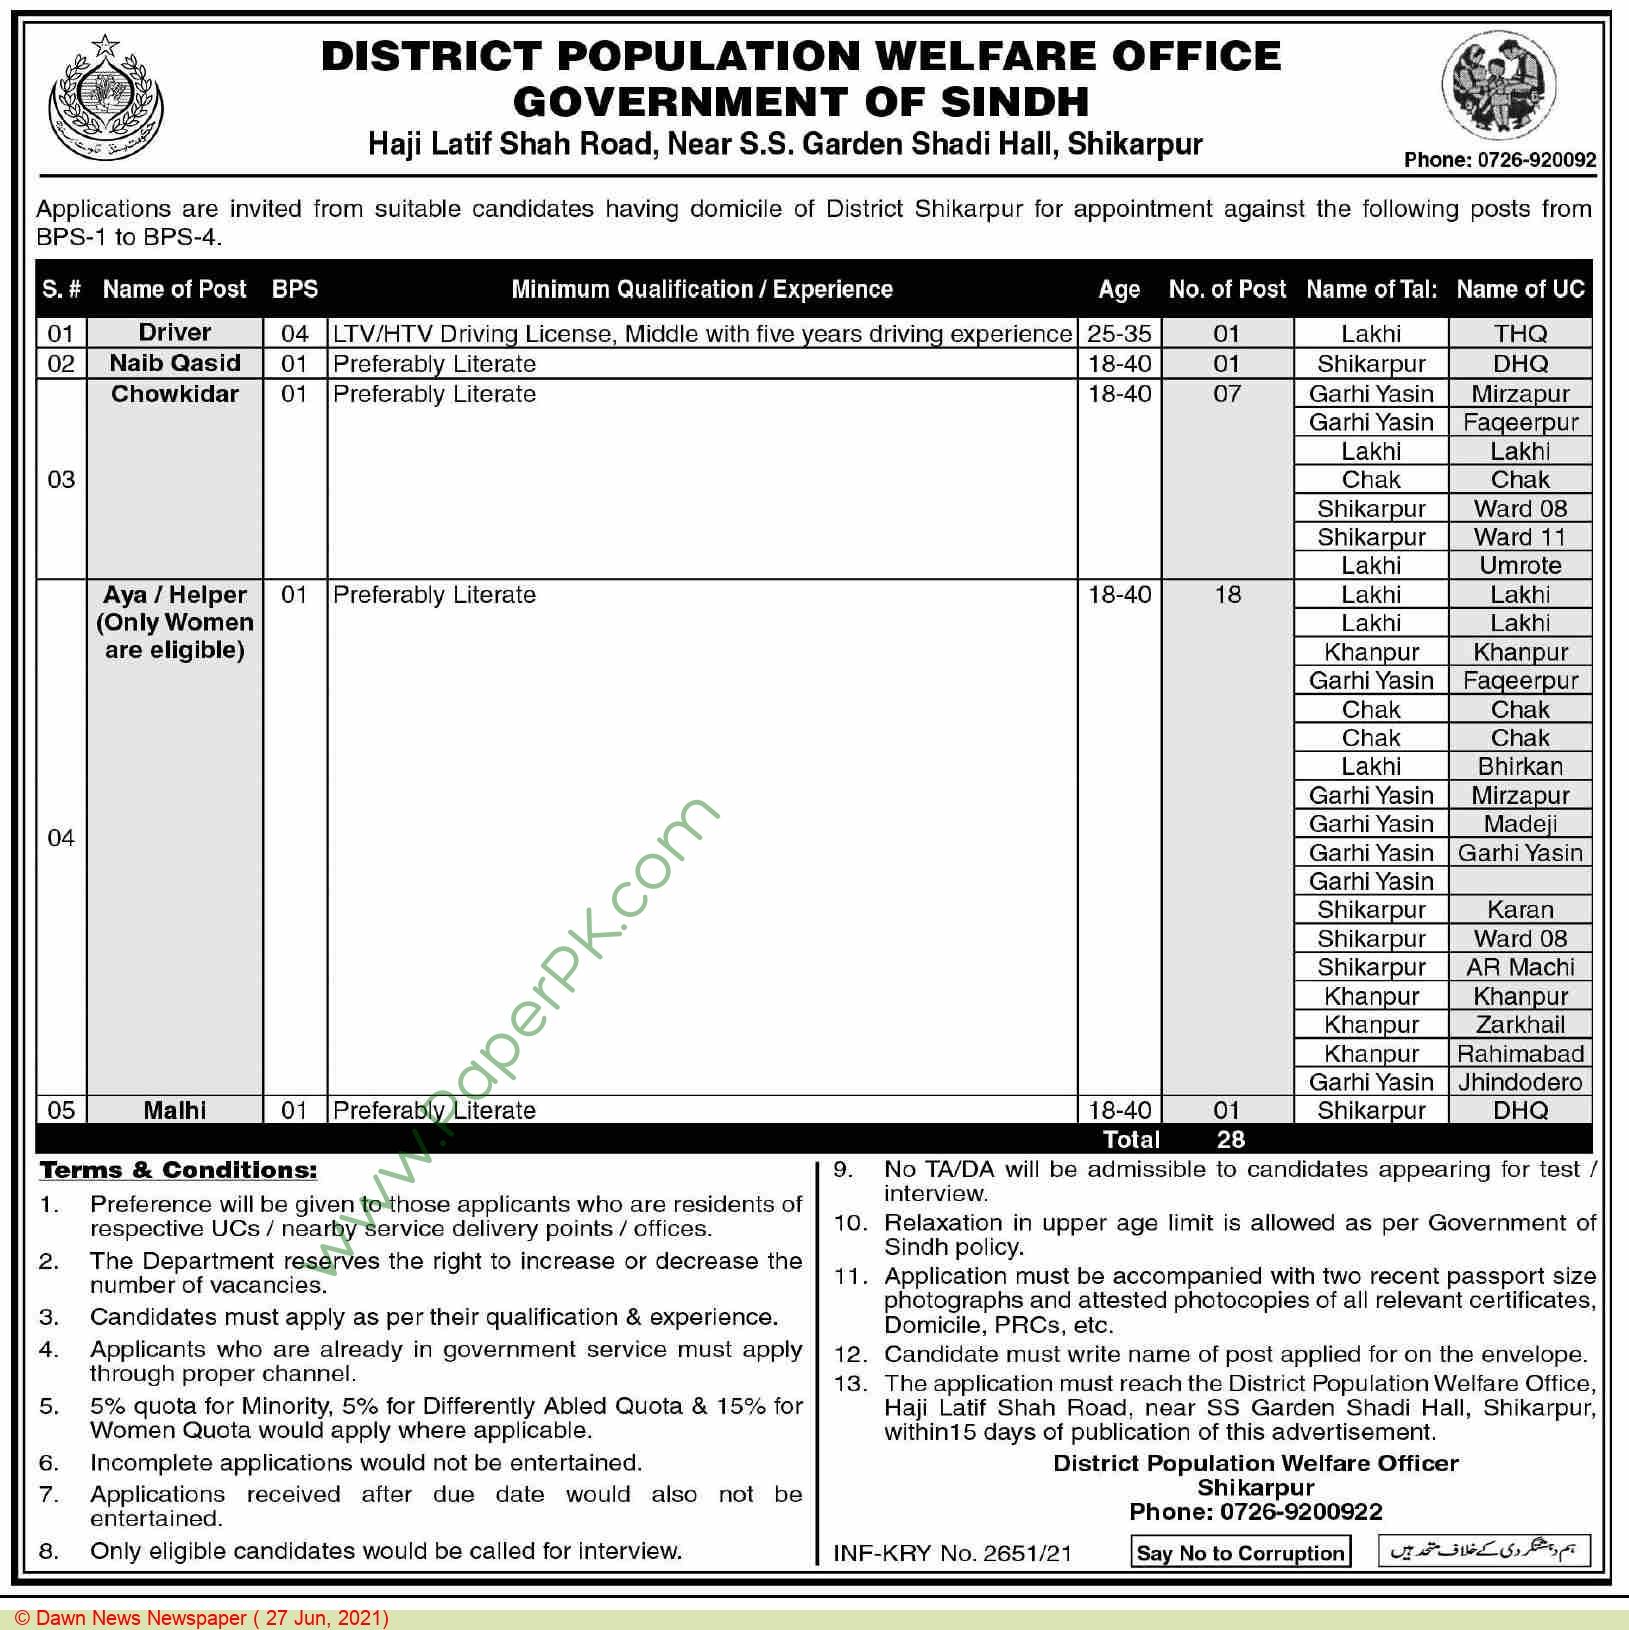 District Population Welfare Office jobs newspaper ad for Naib Qasid in Shikarpur on 2021-06-27